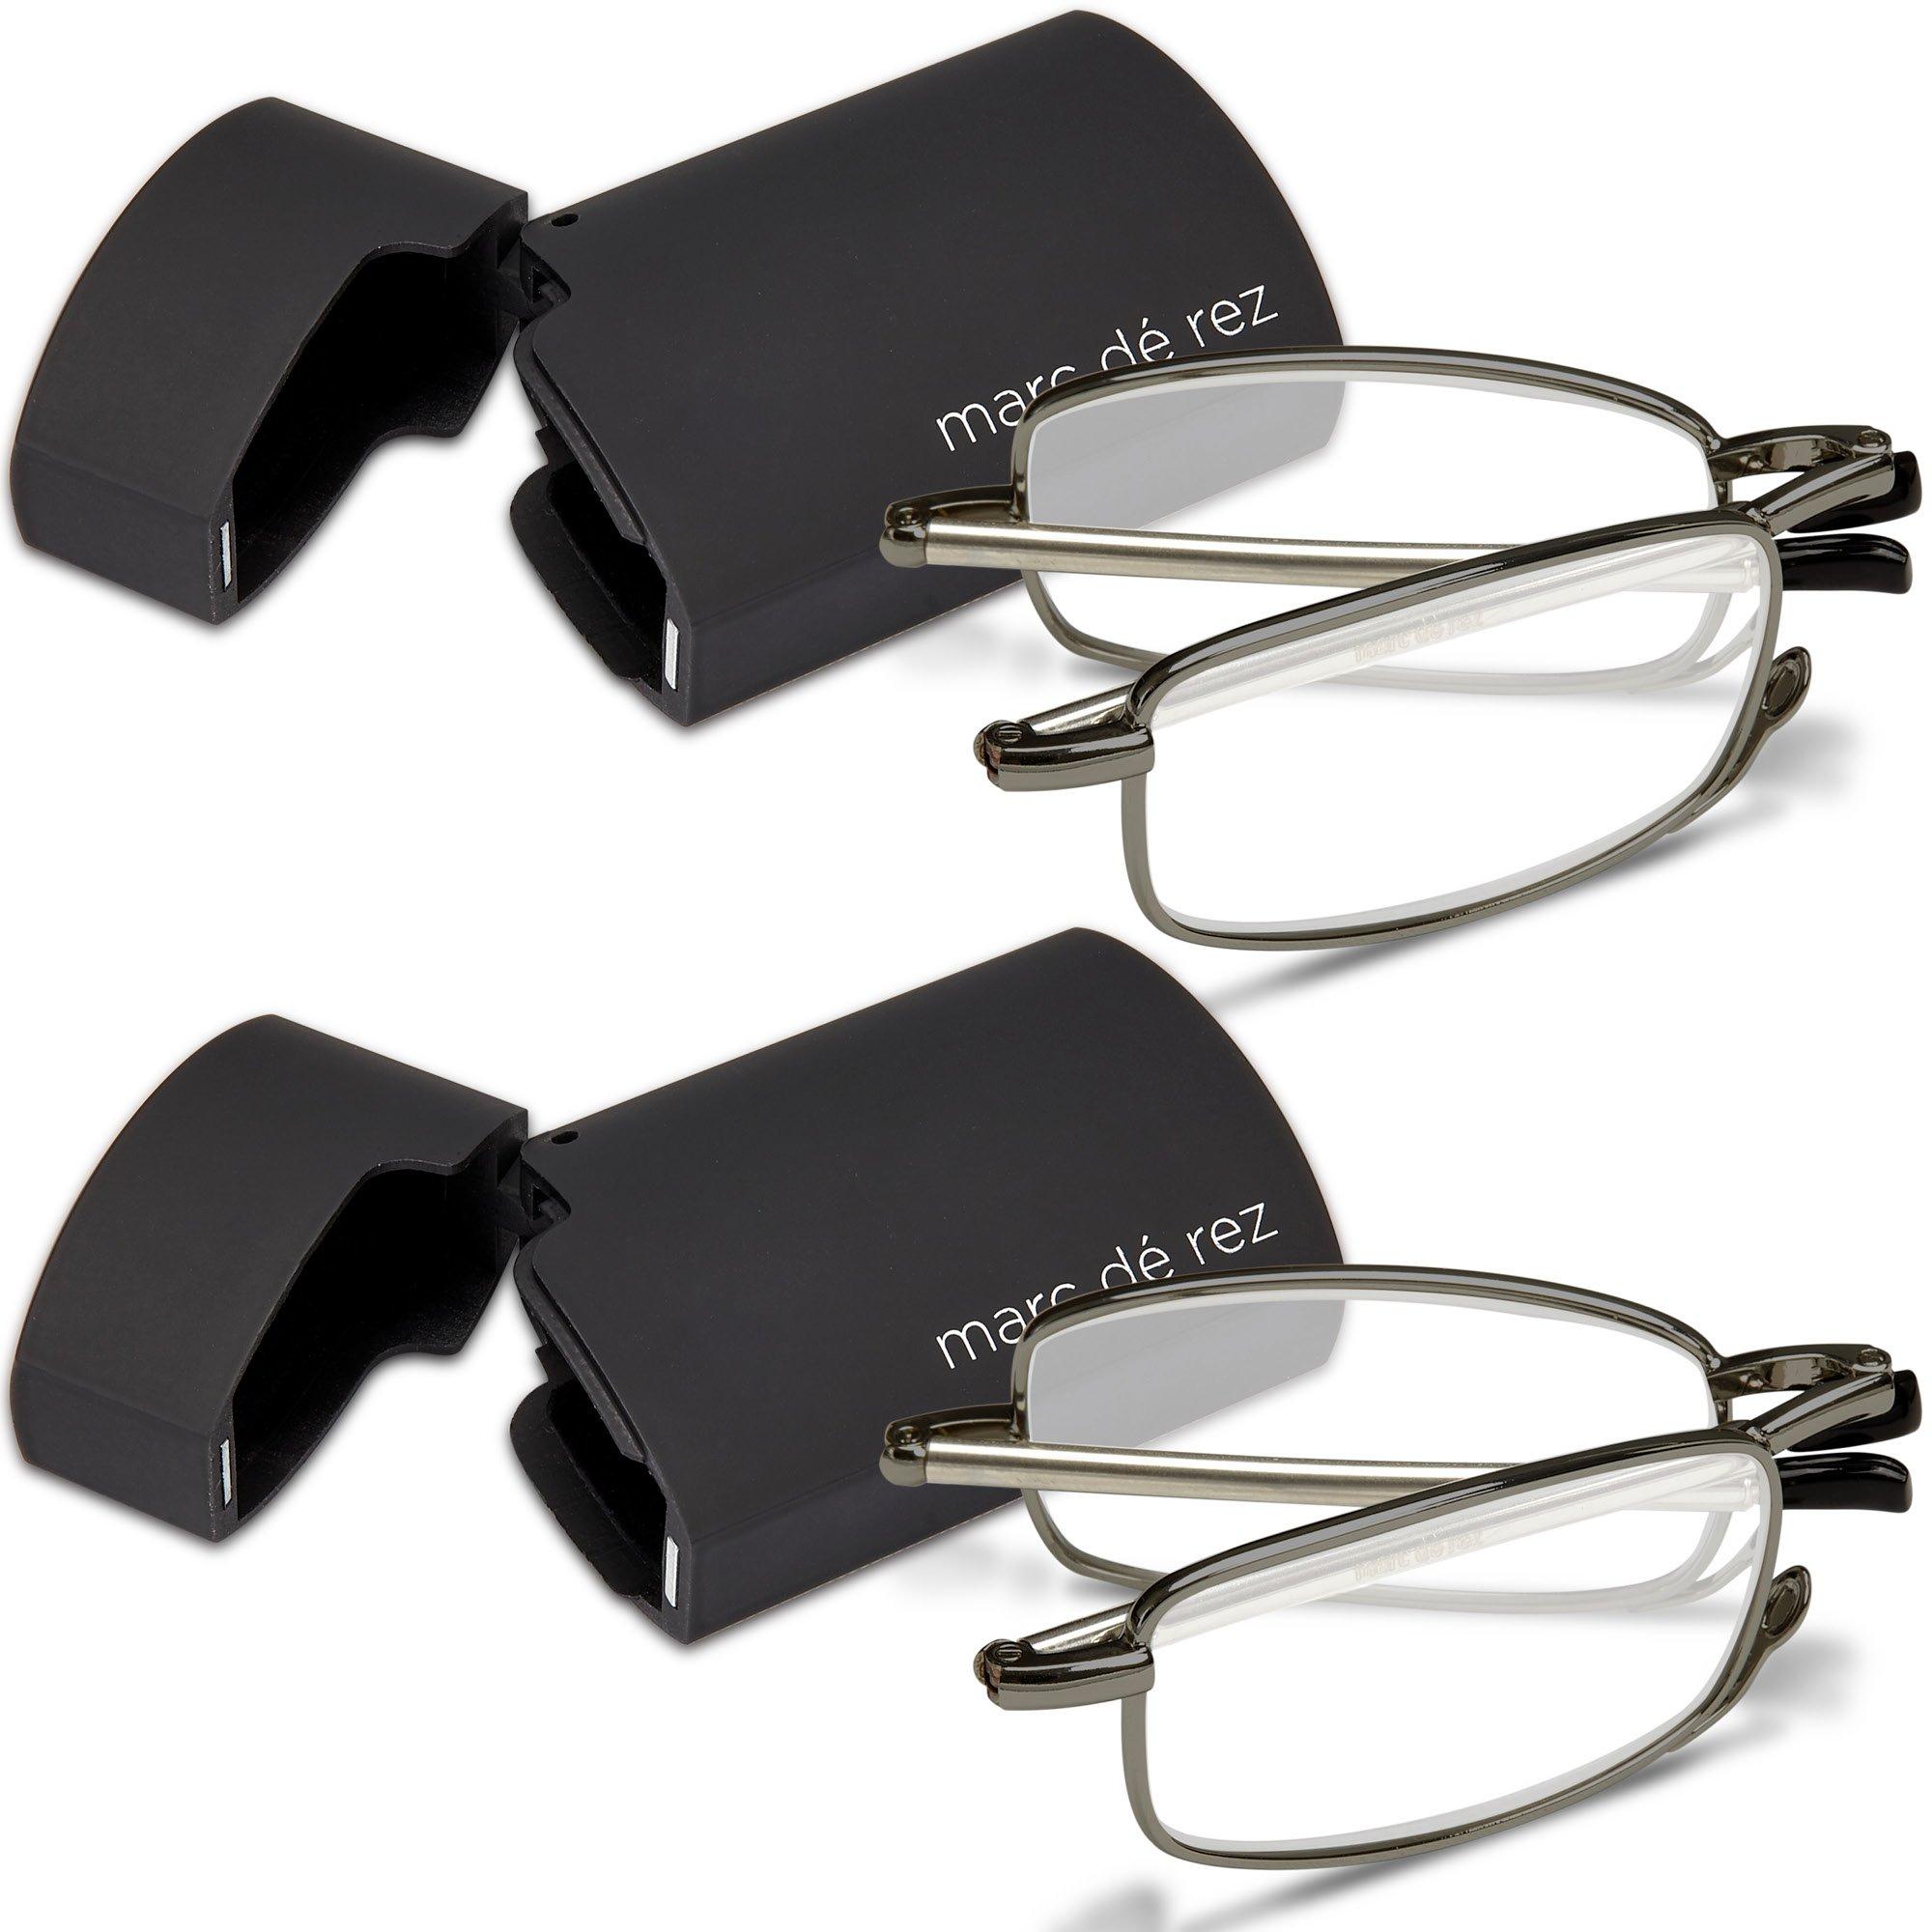 Marc De Rez Foldable Reading Glasses +1.75-2 Pack - Mini Flip Top Cases - Gunmetal Grey Folding Prescription Mini Reading Glasses For Men and Women by Marc De Rez